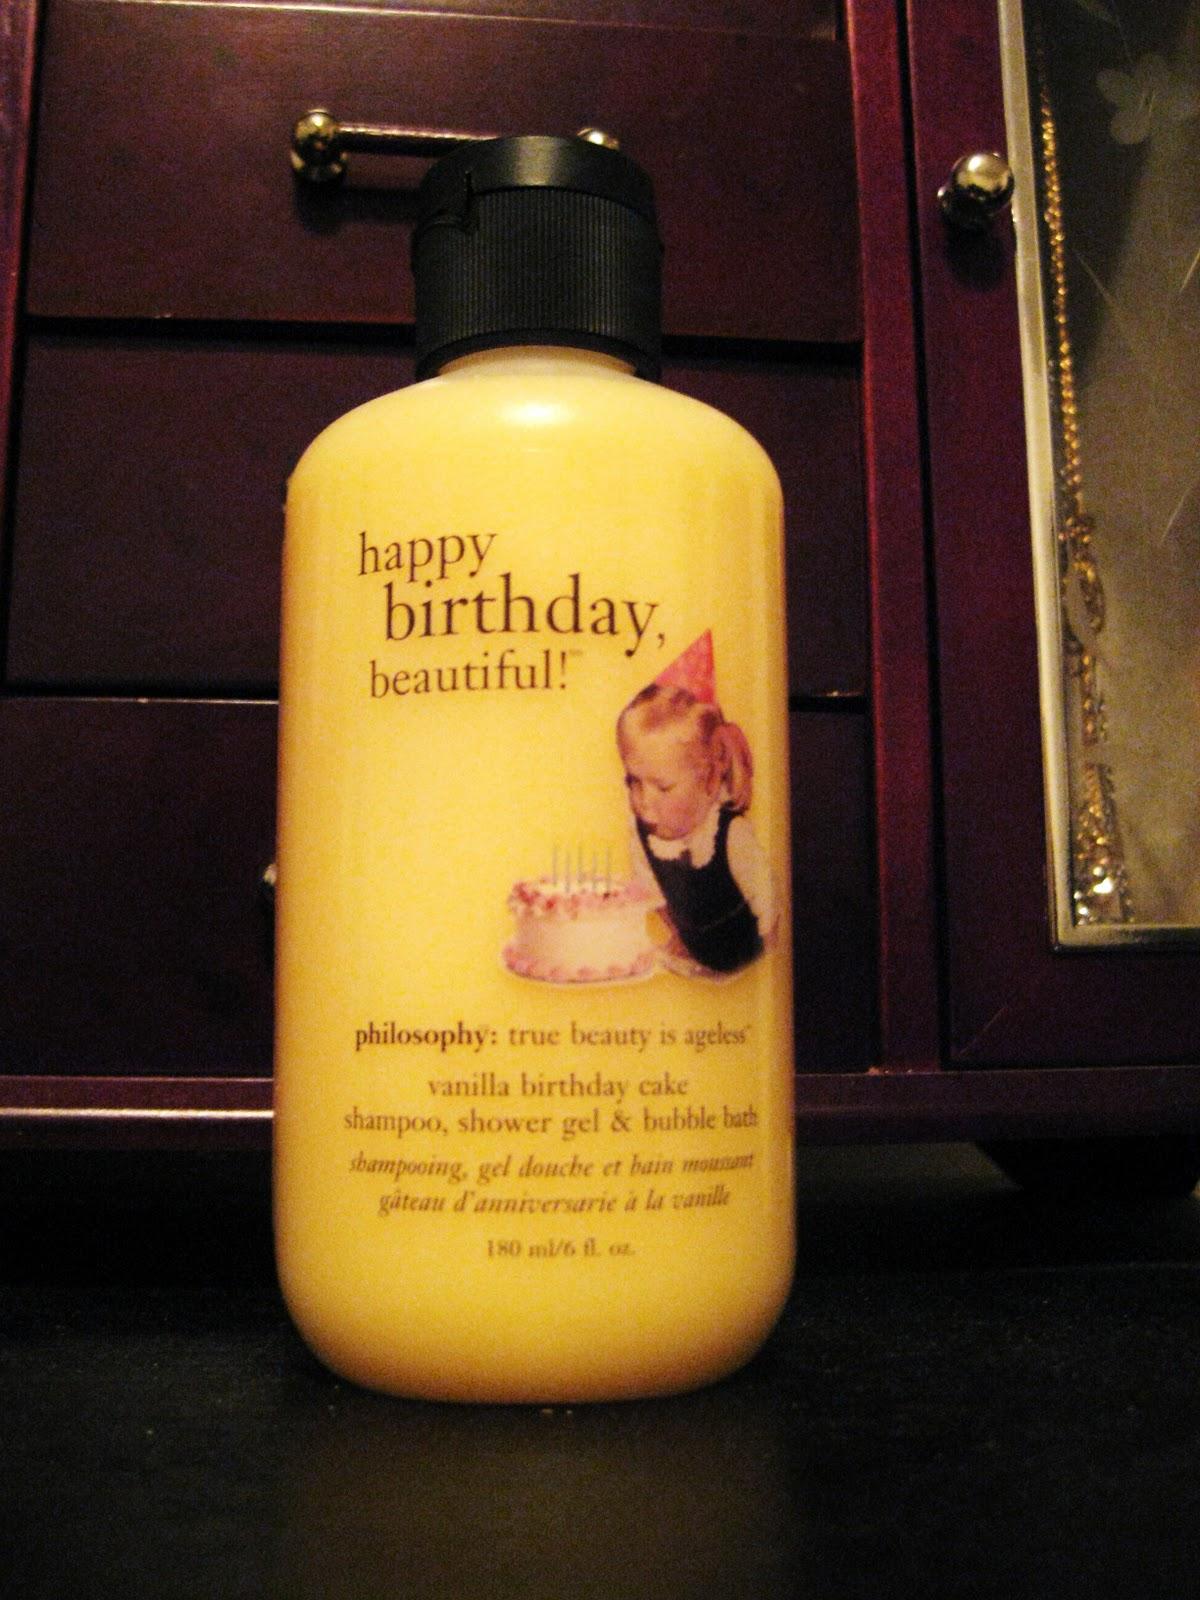 Free Birthday Stuff ~ Free birthday stuff gift at sephora